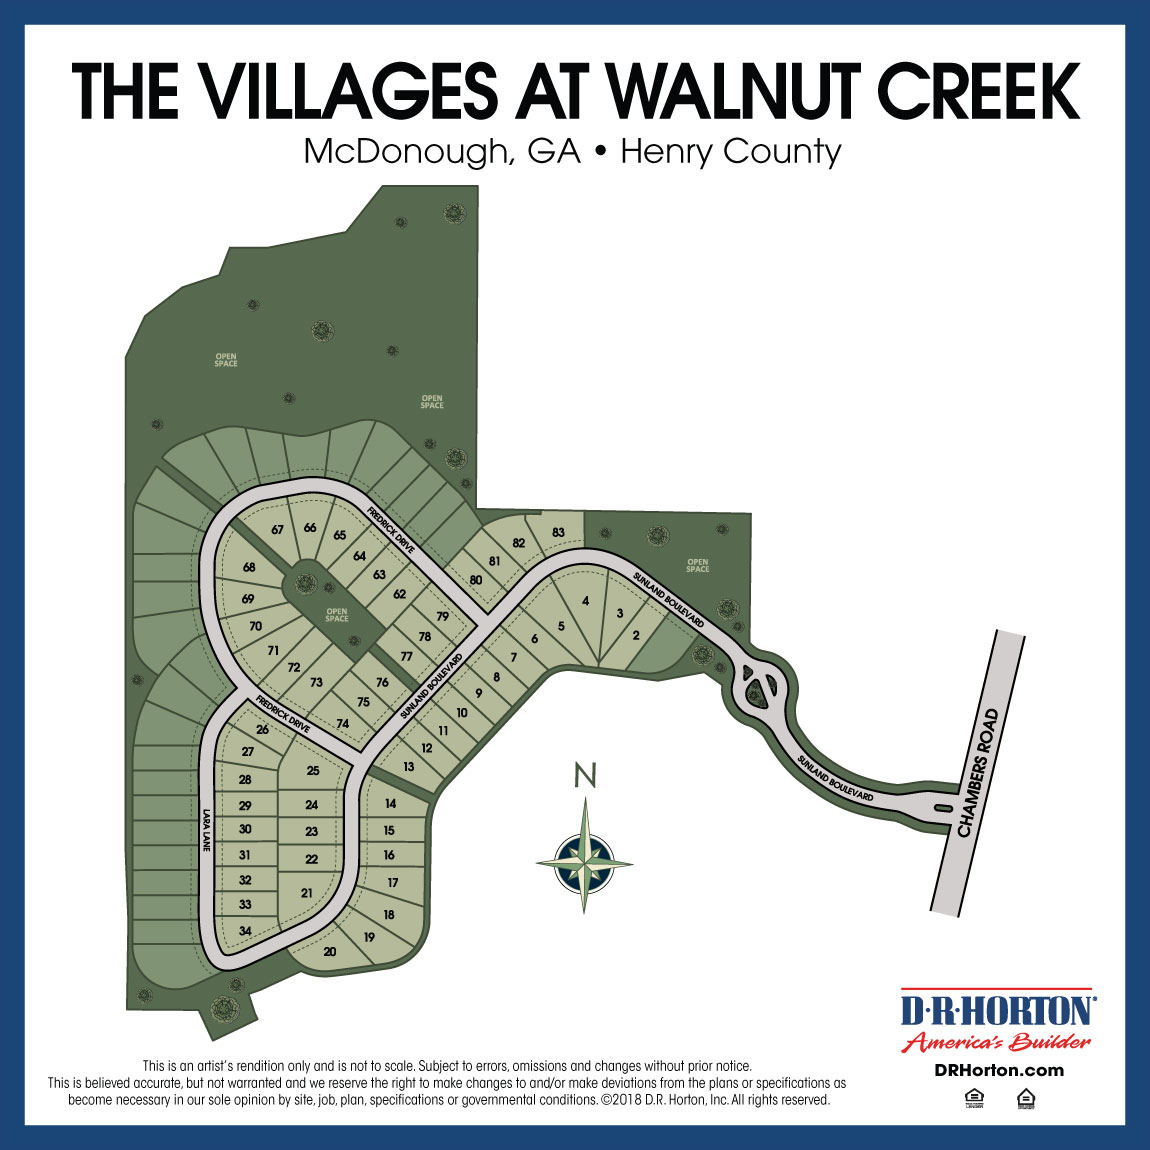 Walnut Glen Apartments: New Homes In The Villages At Walnut Creek